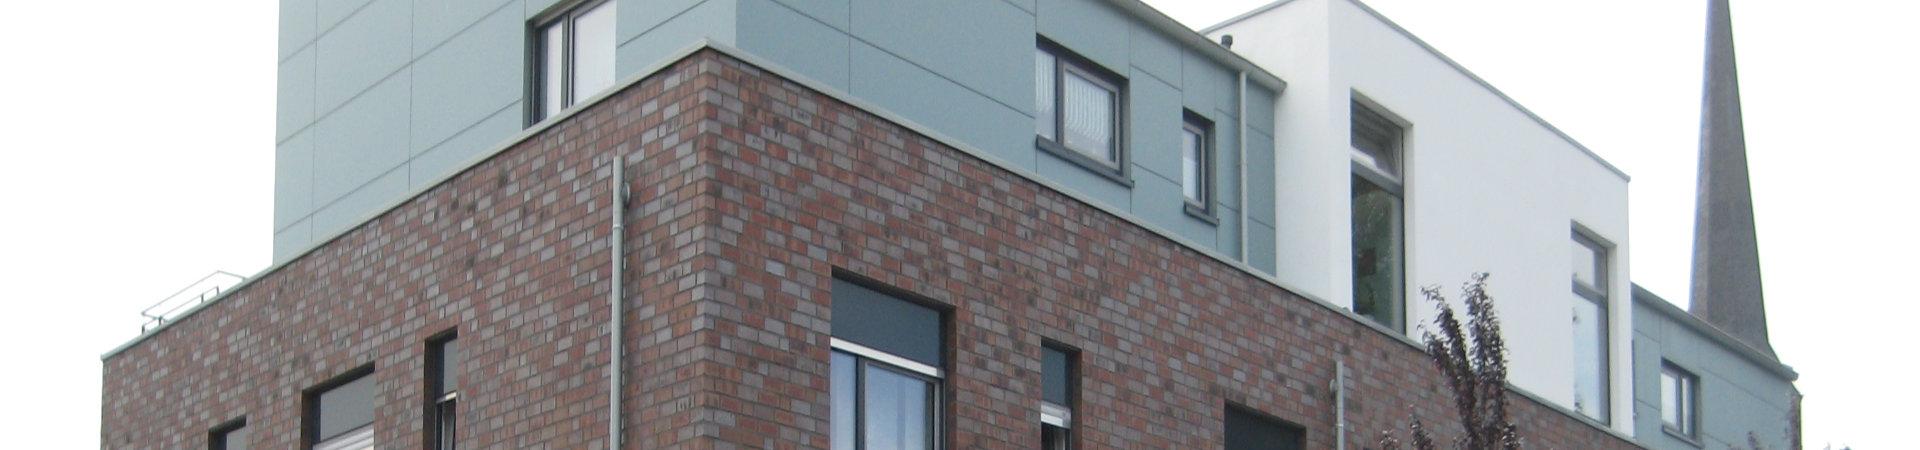 Ingenieurbüro Hammes - Viersen / Mönchengladbach - Neubau Mehrfamilienhaus